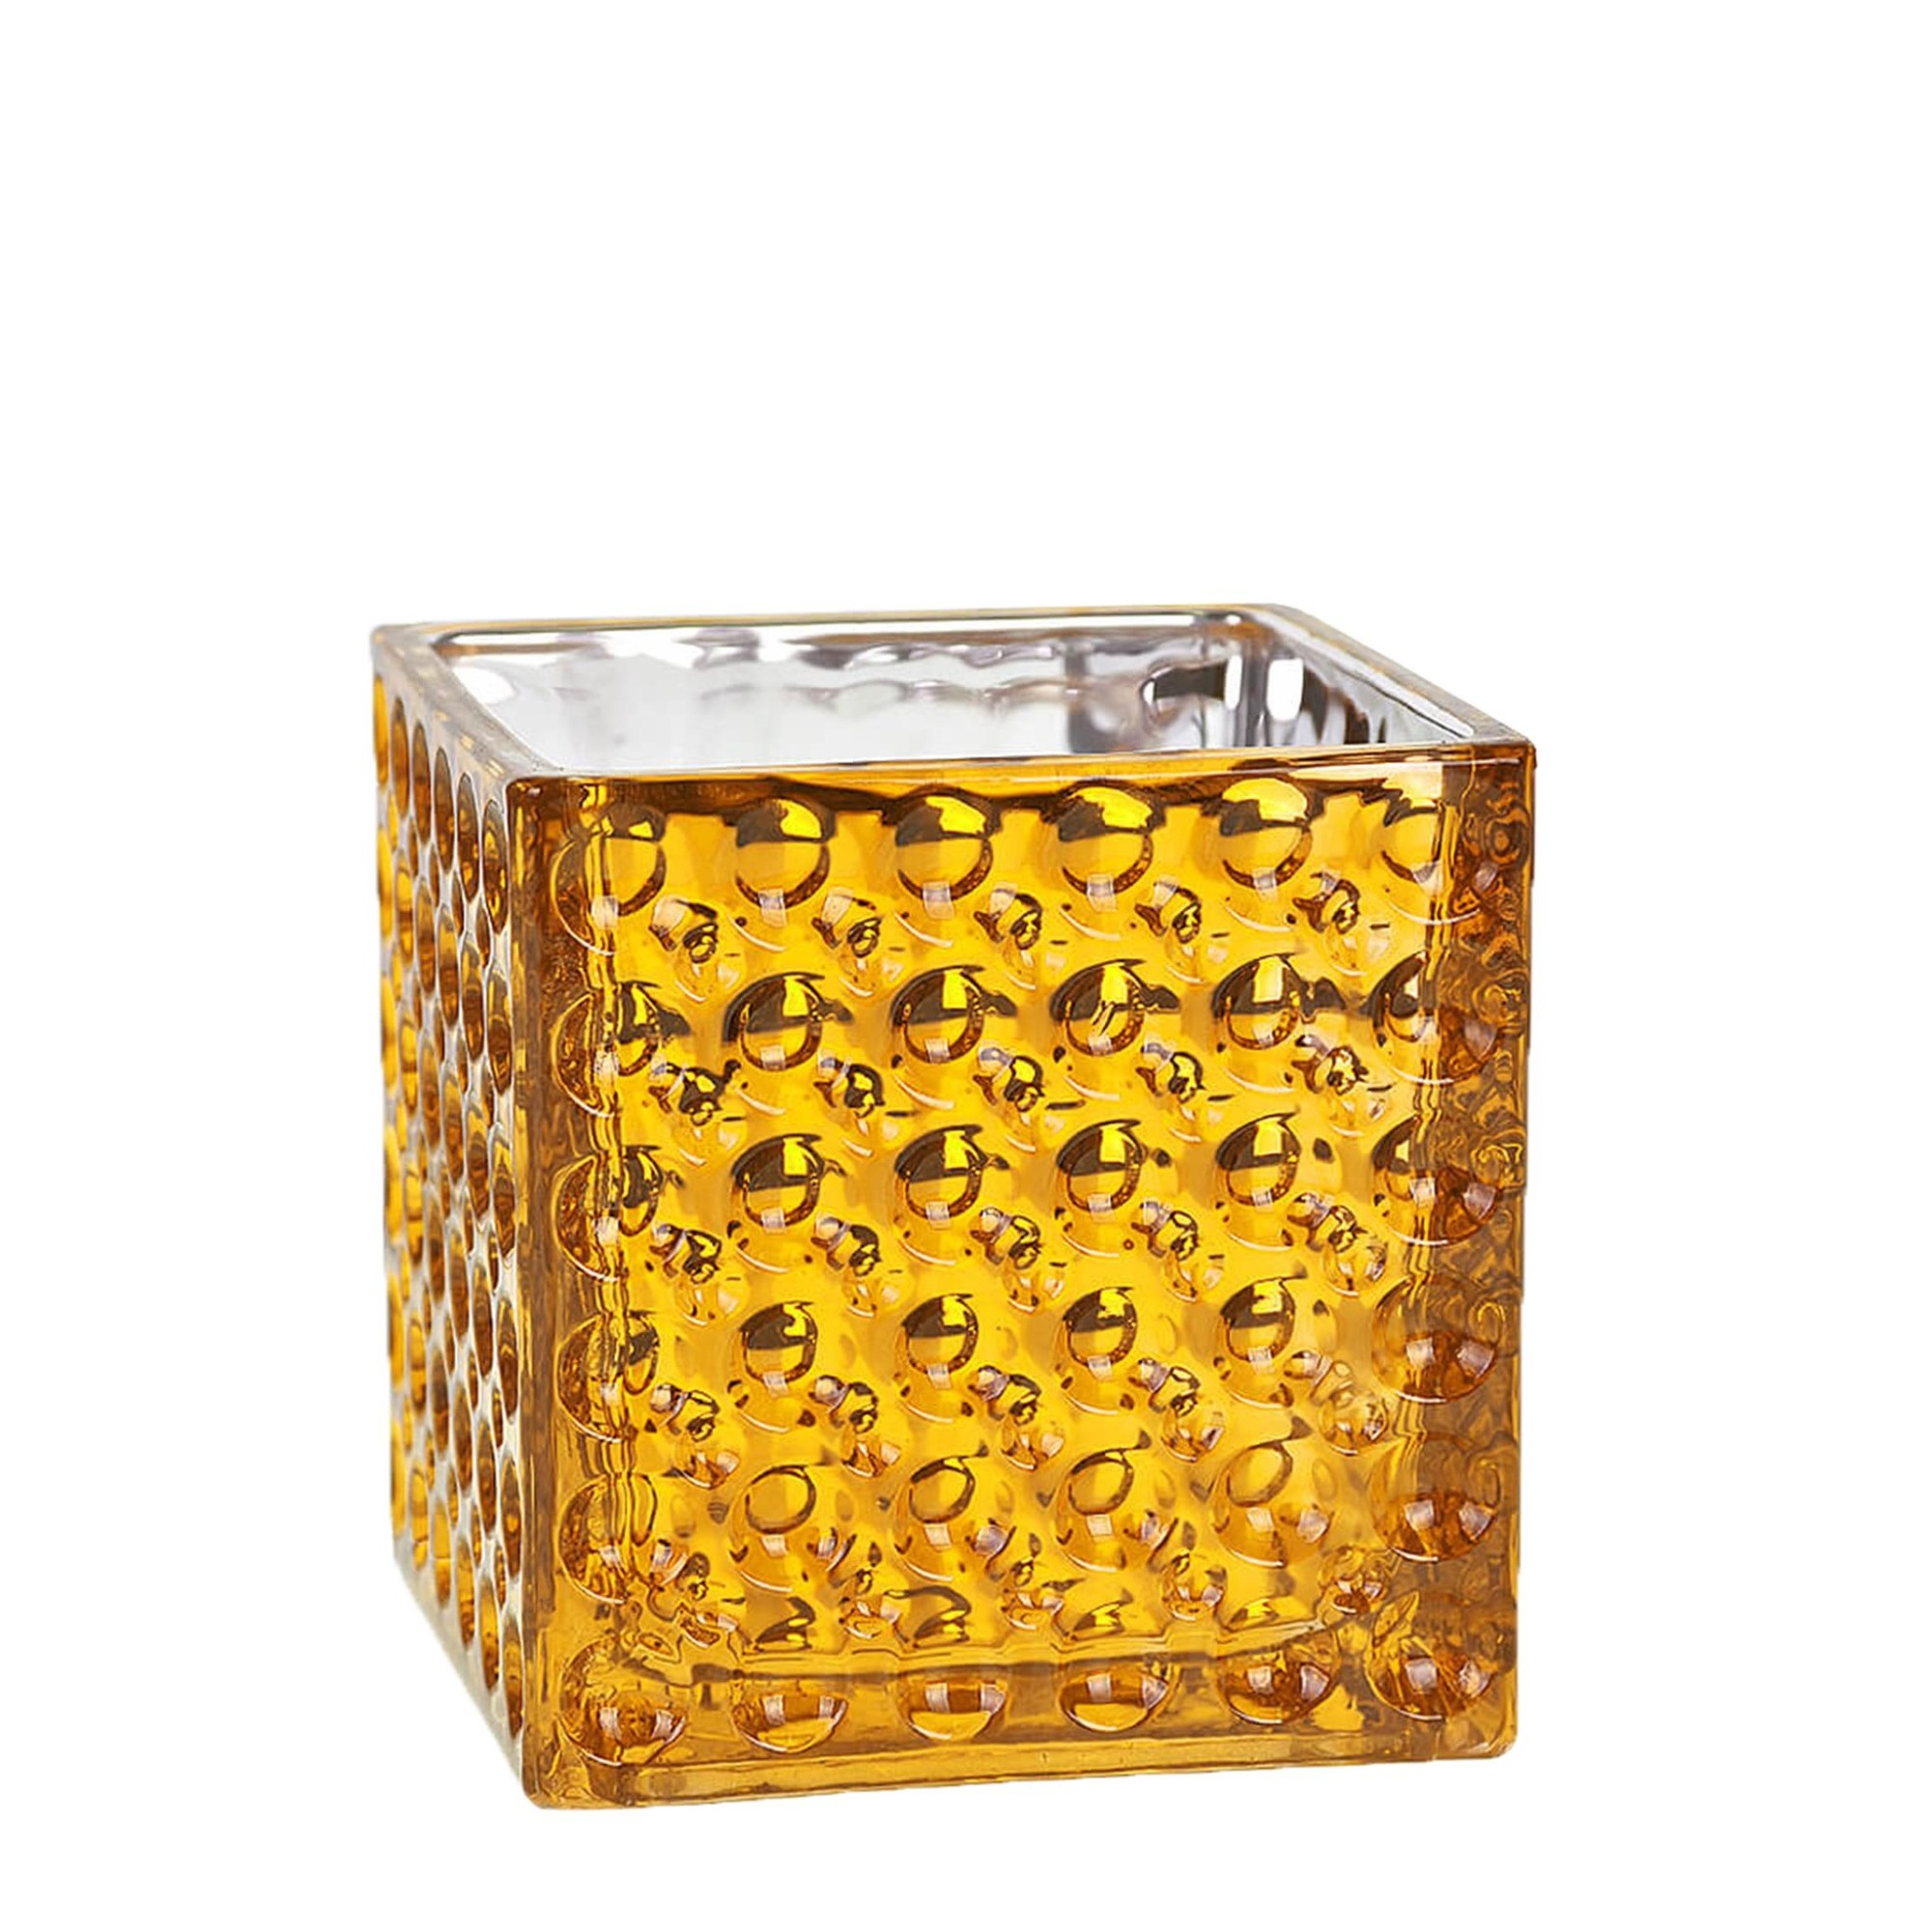 Vaso Decorativo de Vidro Quadrado 10cm Dourado